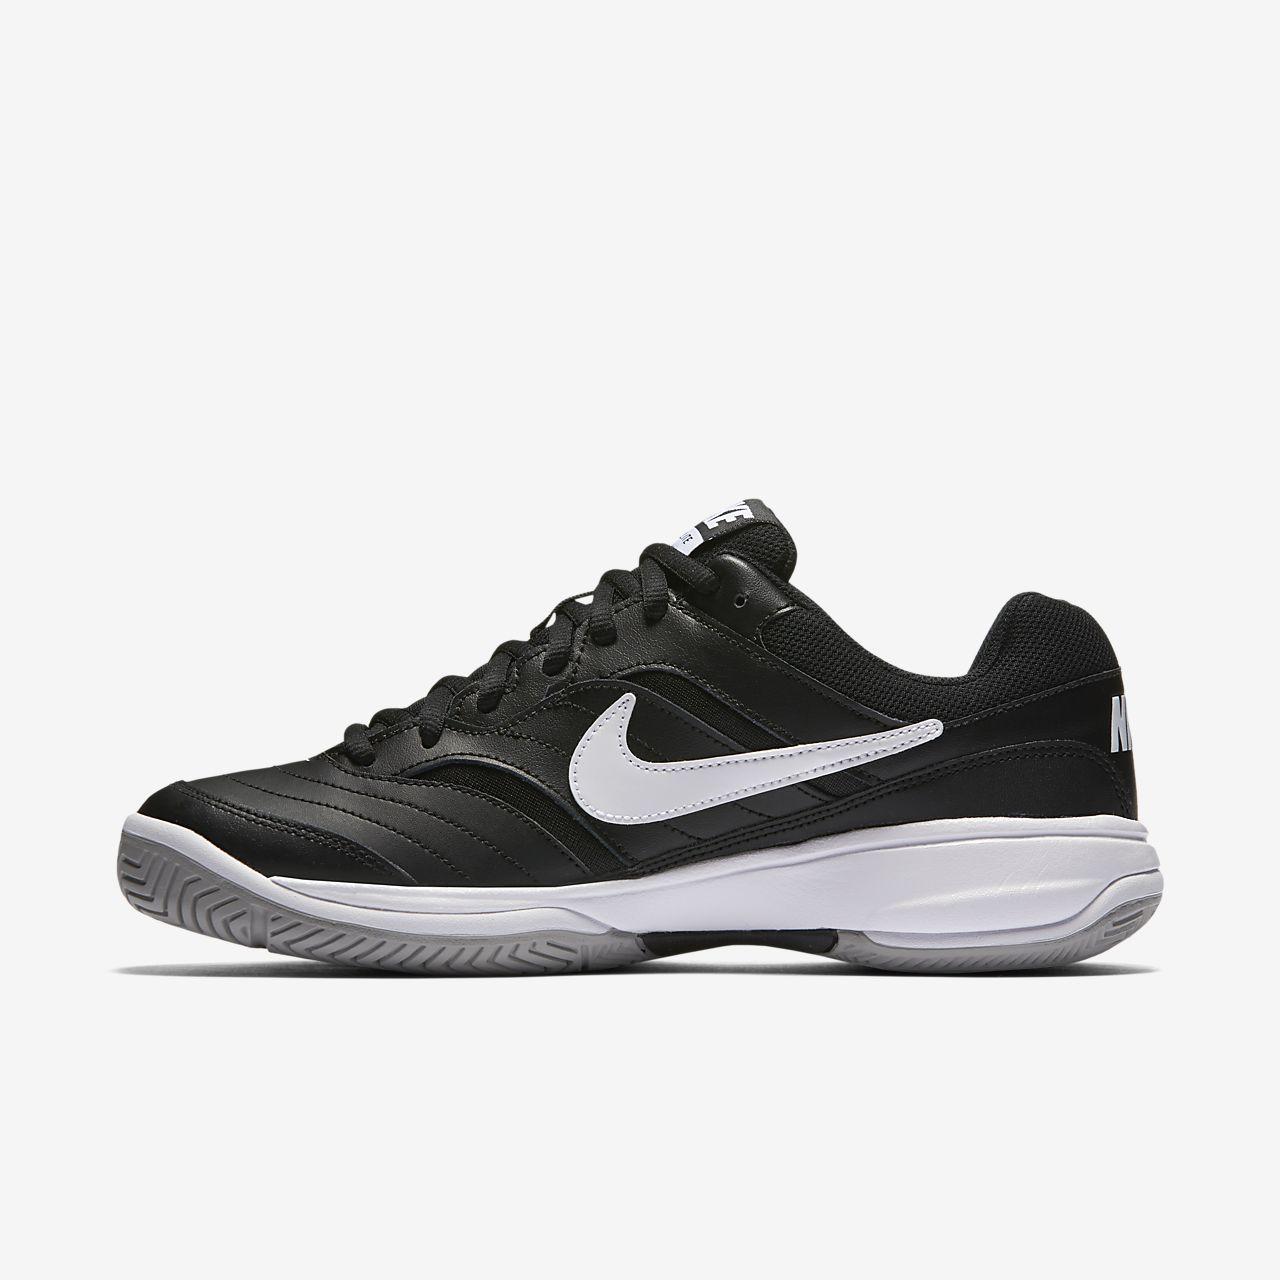 e35c9e0ba525 NikeCourt Lite Men s Hard Court Tennis Shoe. Nike.com ID